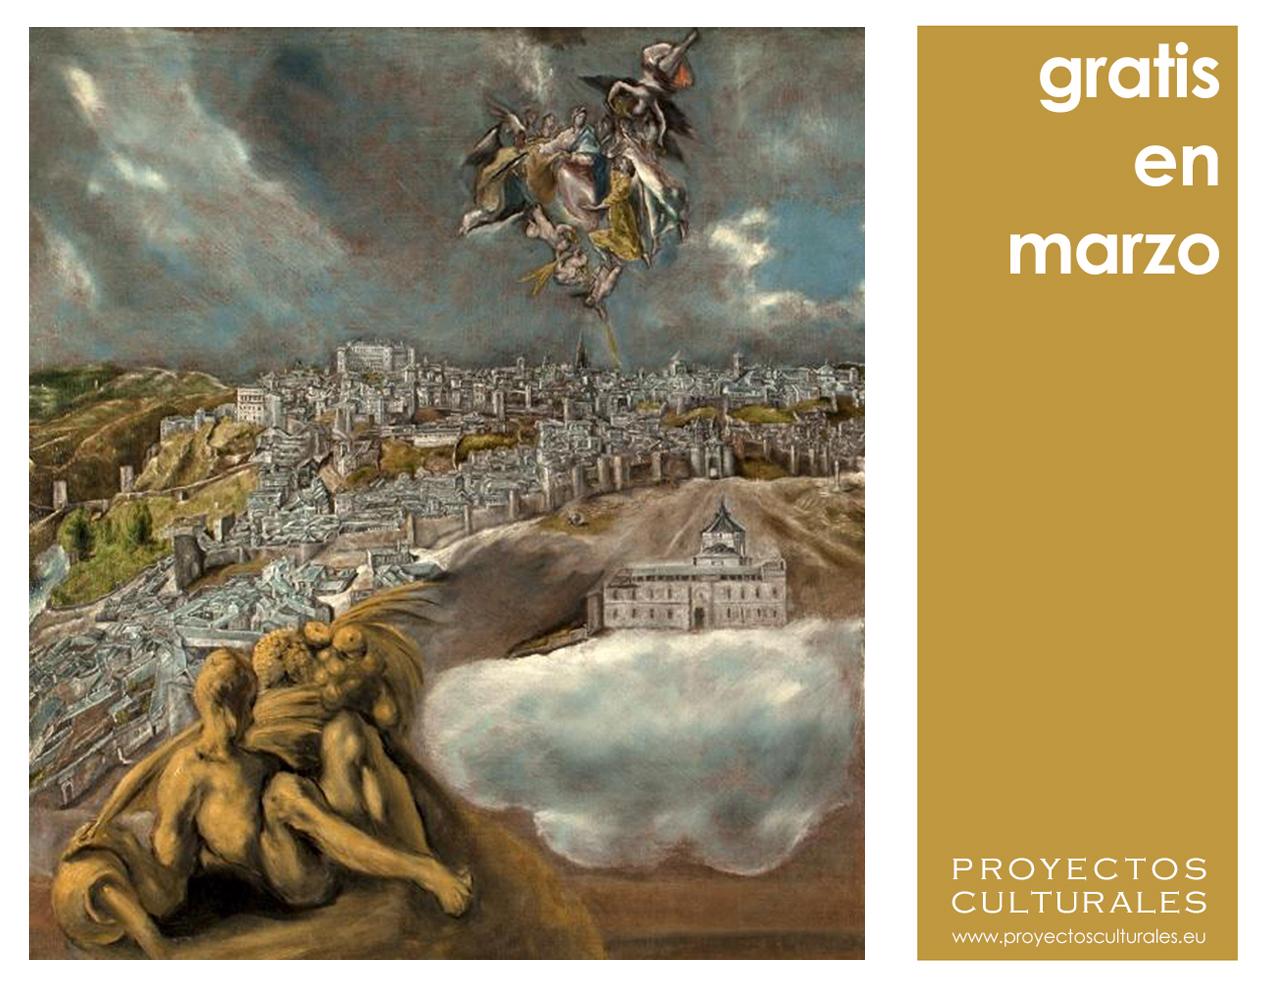 Gratis en marzo Visita Toledo Gratis Proyectos Culturales www.proyectosculturales.eu